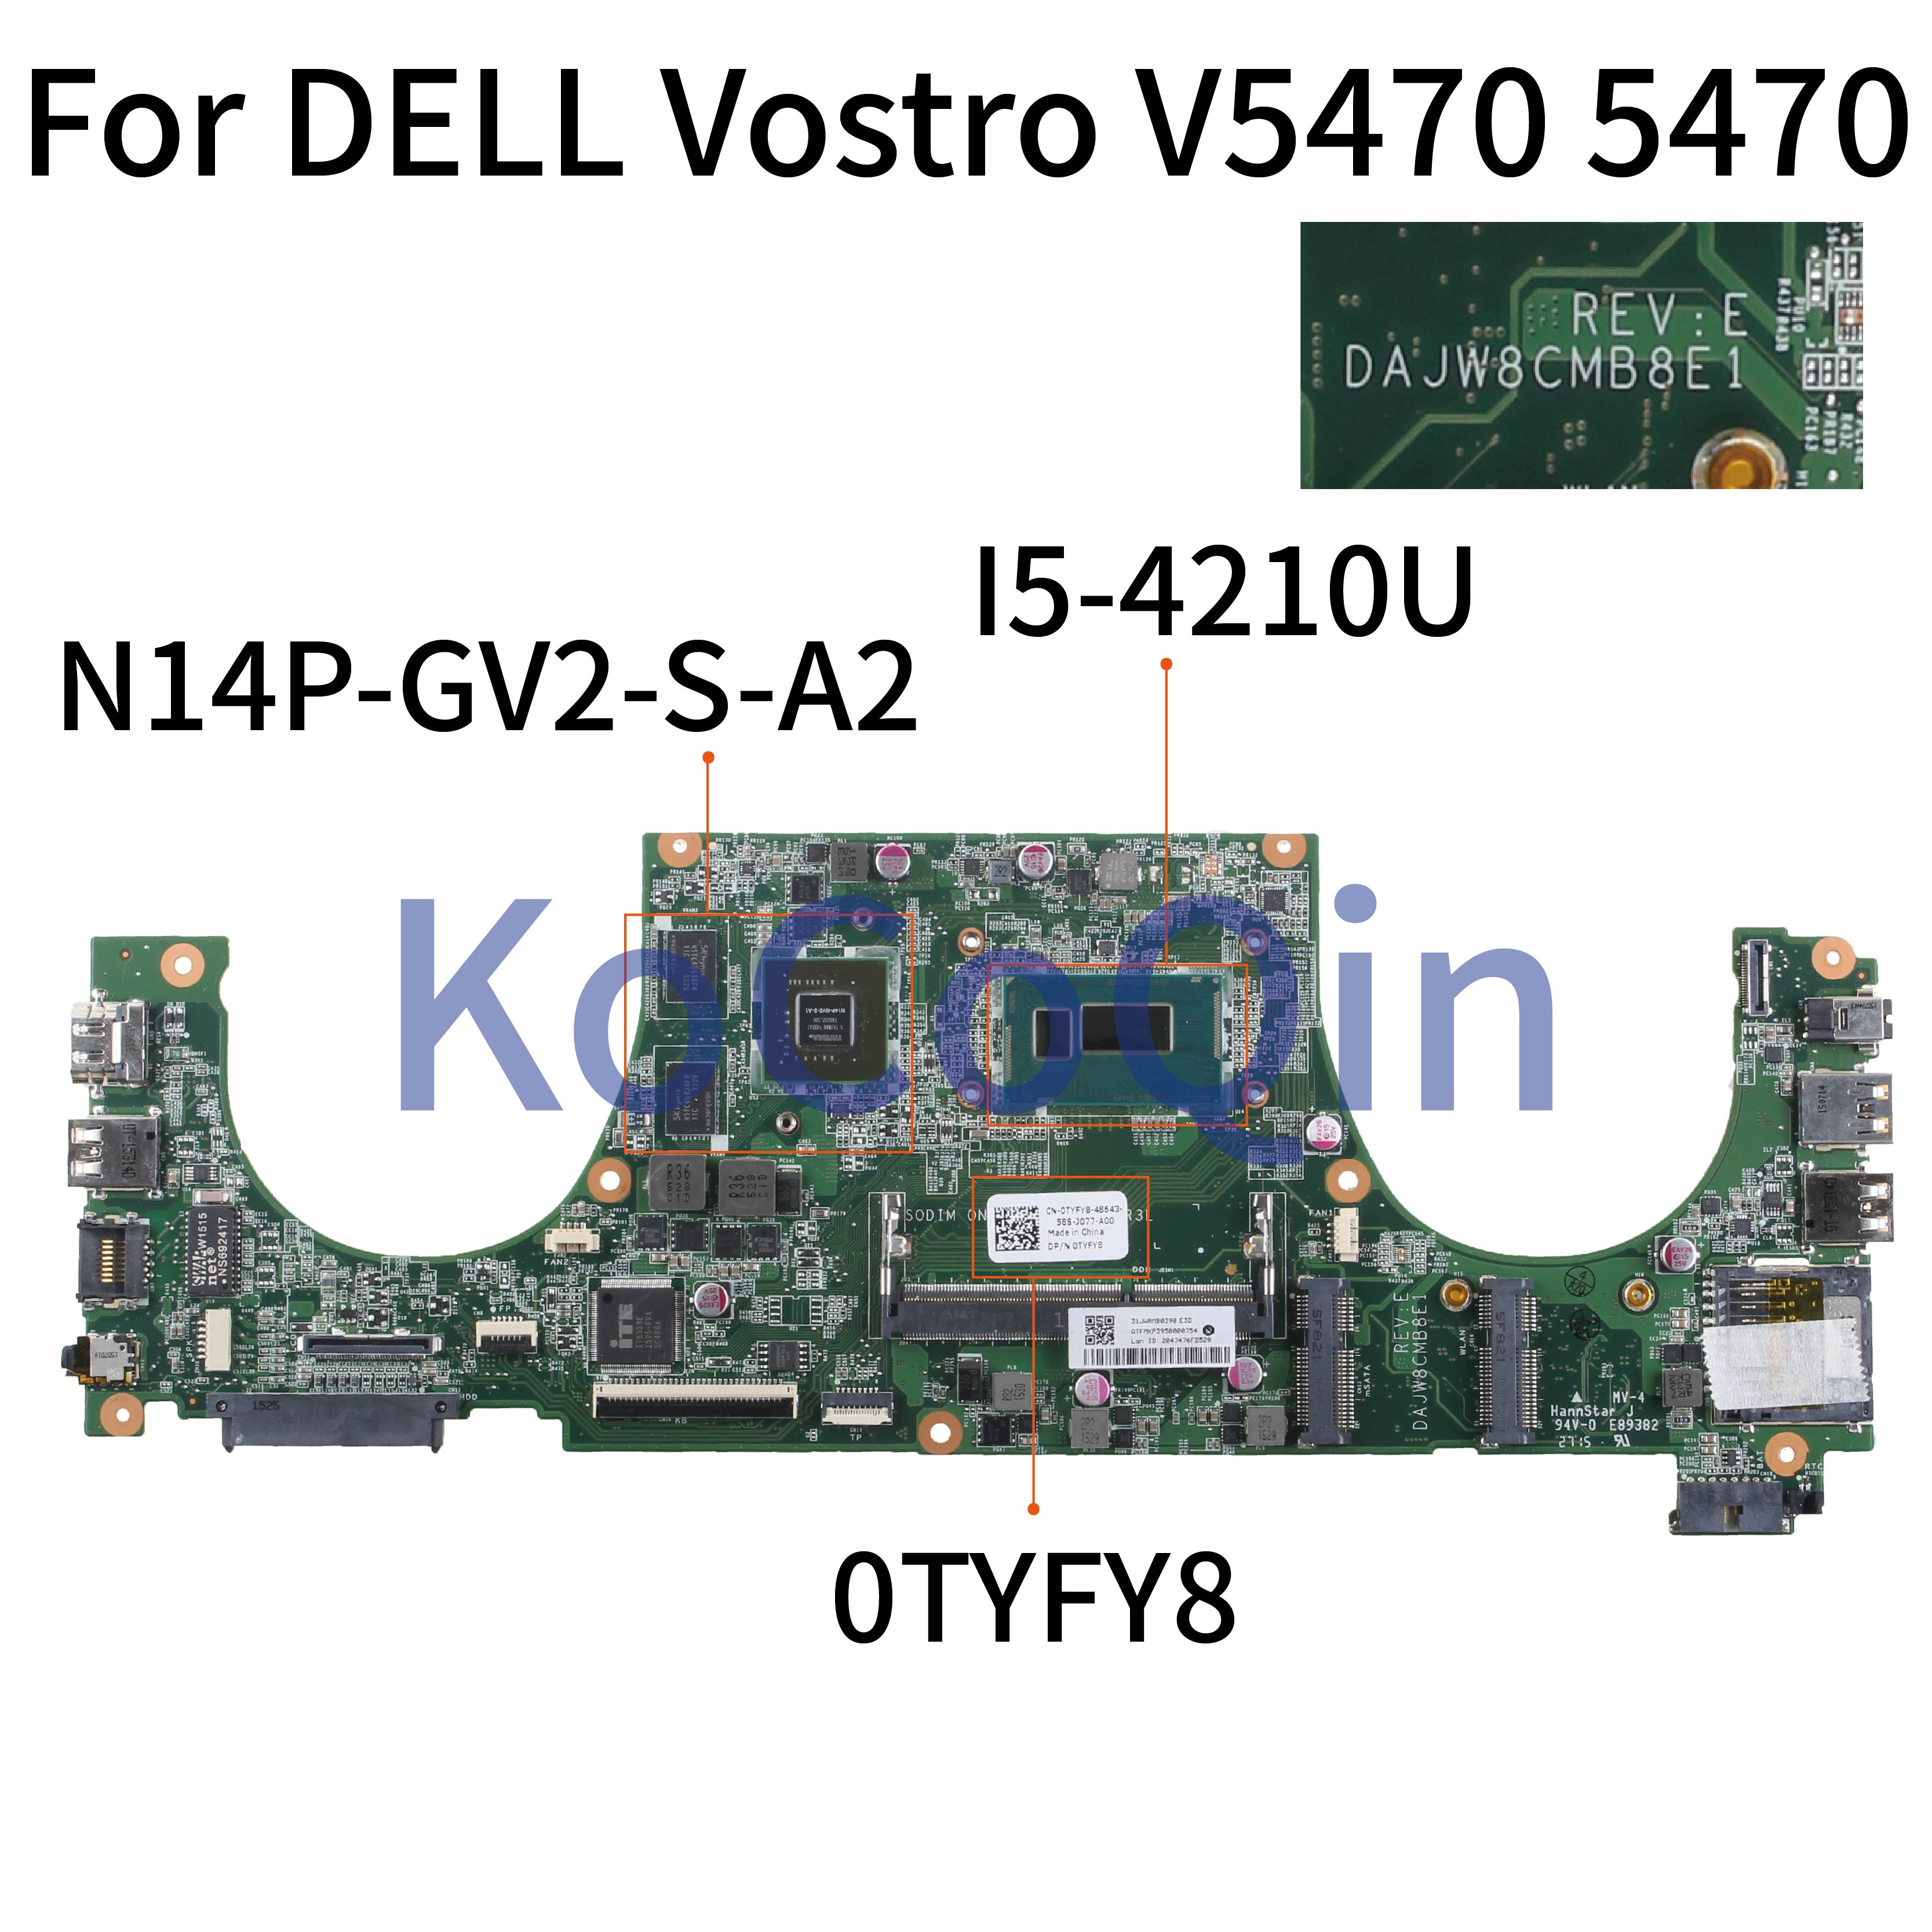 KoCoQin Laptop motherboard Für DELL Vostro 5470 V5470 Core I5-4210U SR1EF Mainboard CN-0TYFY8 0TYFY8 DAJW8CMB8E1 N14P-GV2-S-A2